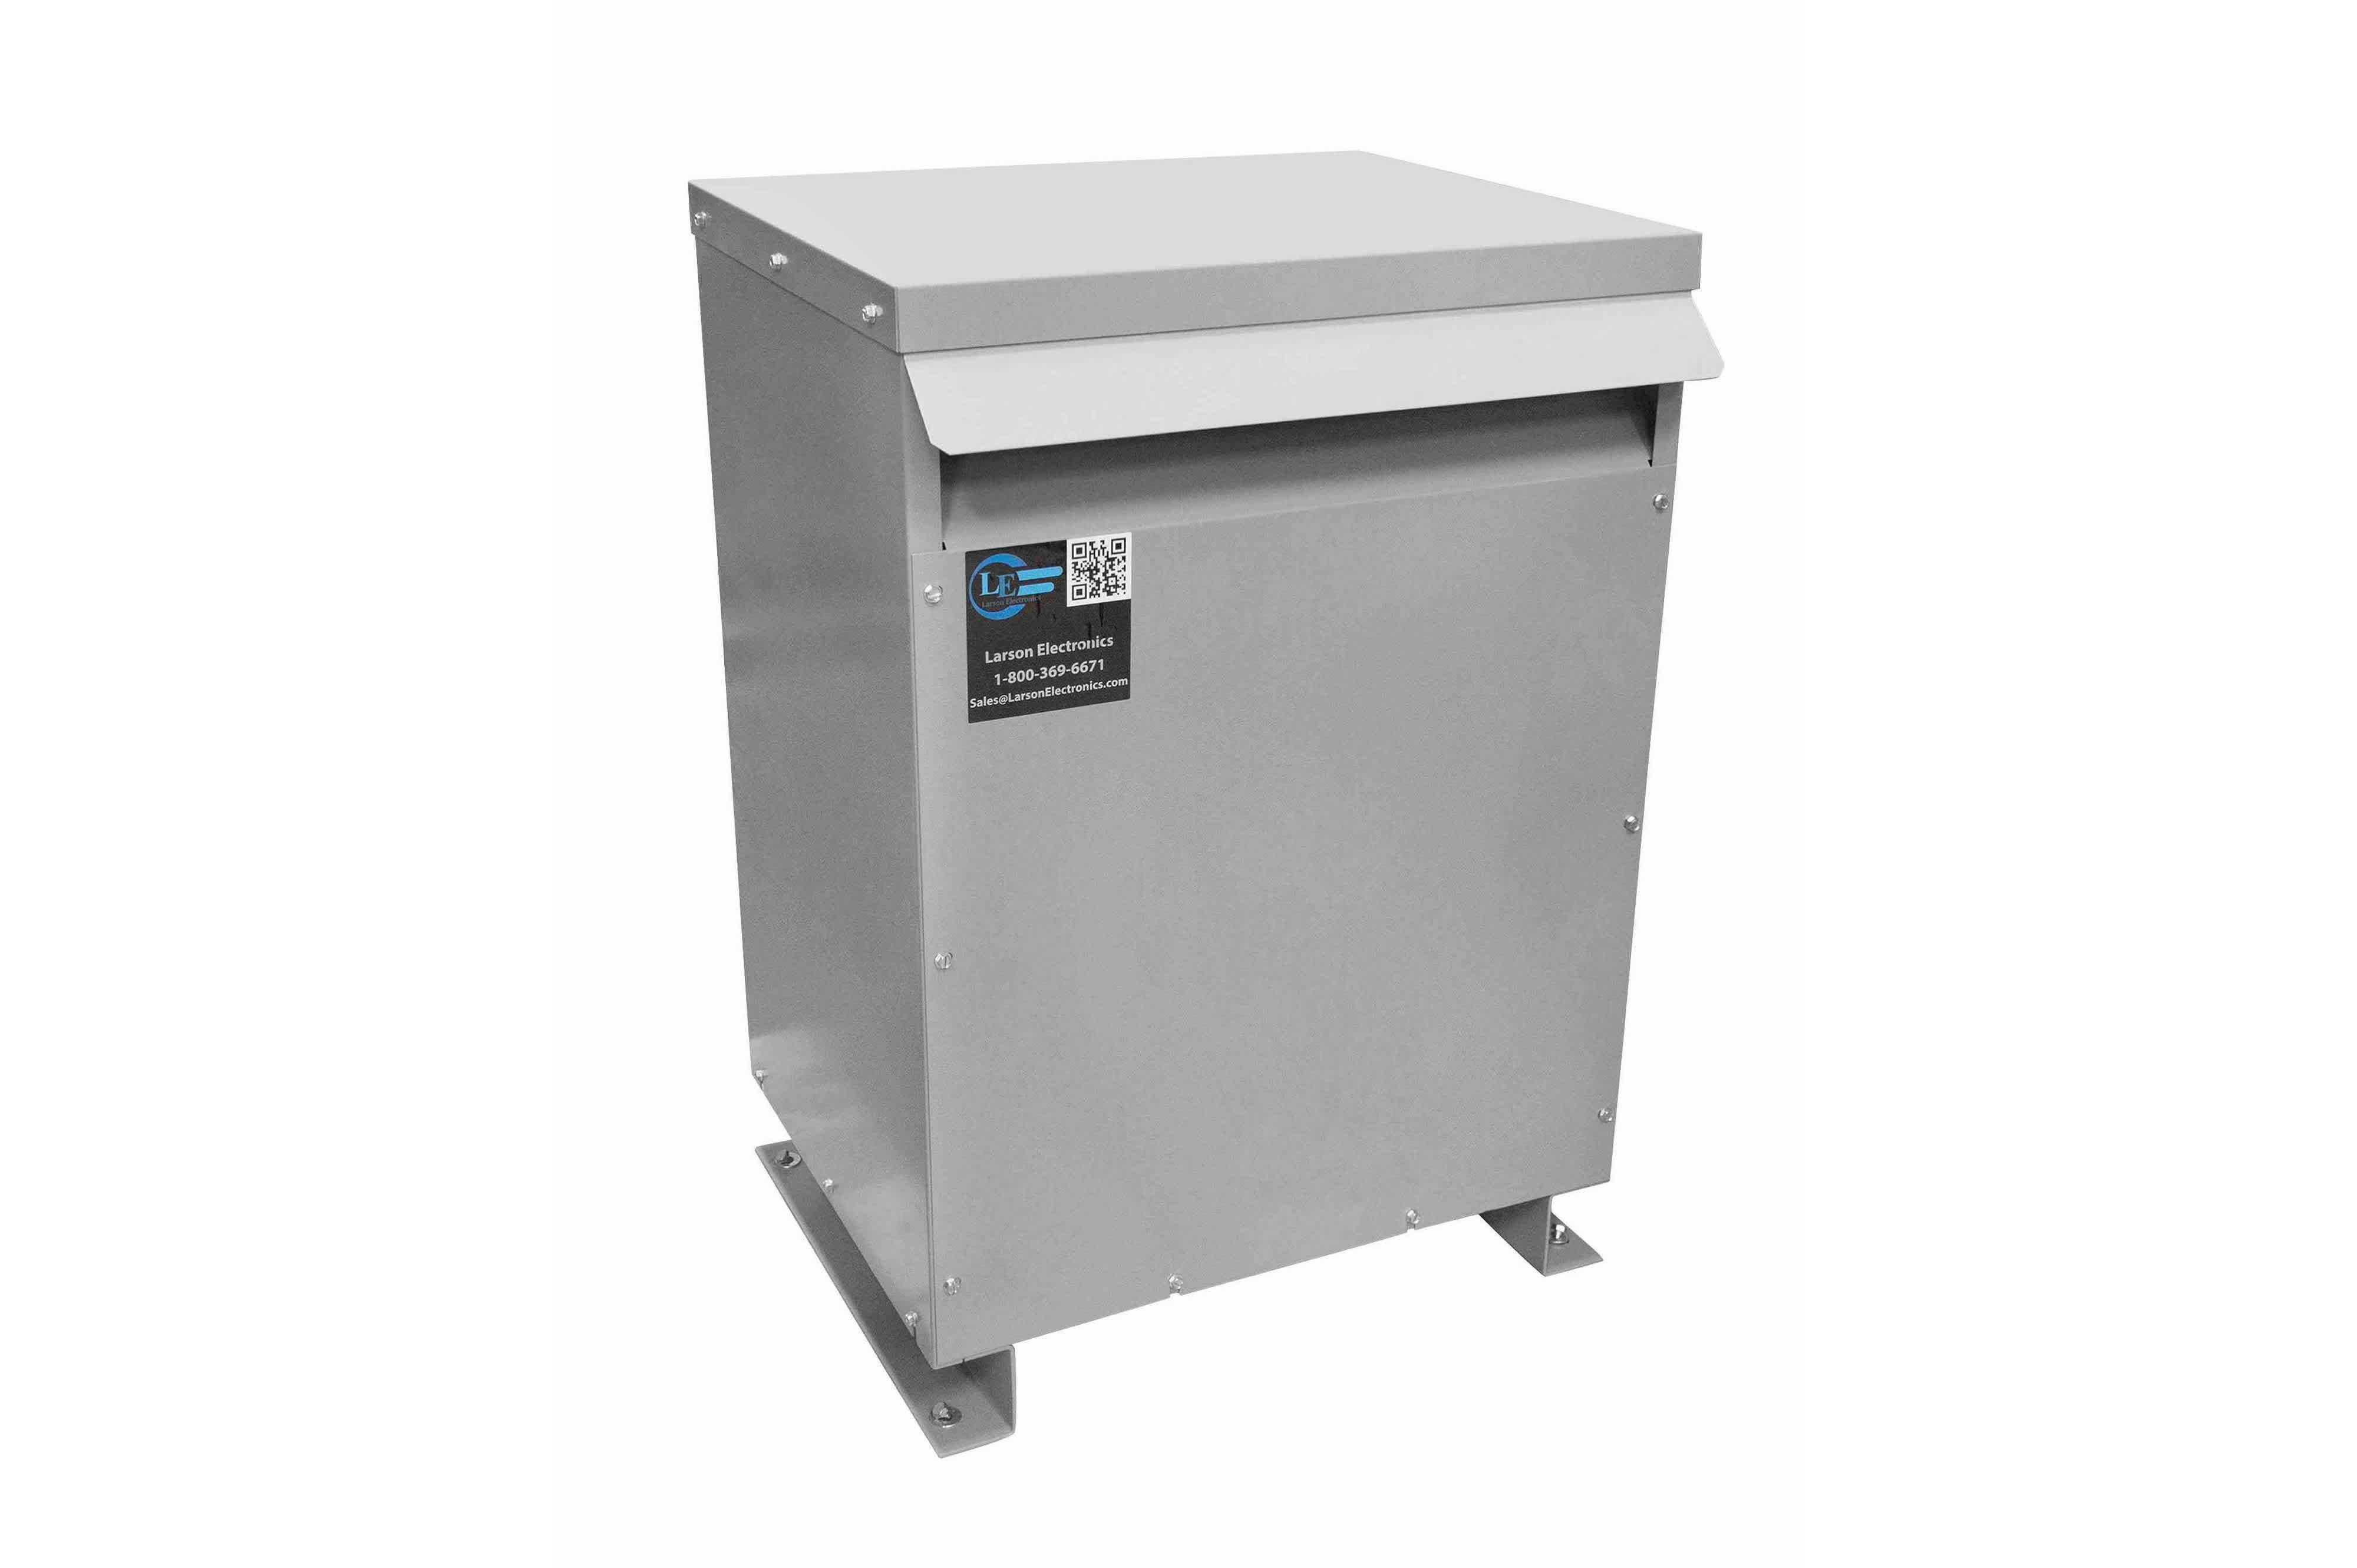 25 kVA 3PH Isolation Transformer, 575V Wye Primary, 400V Delta Secondary, N3R, Ventilated, 60 Hz